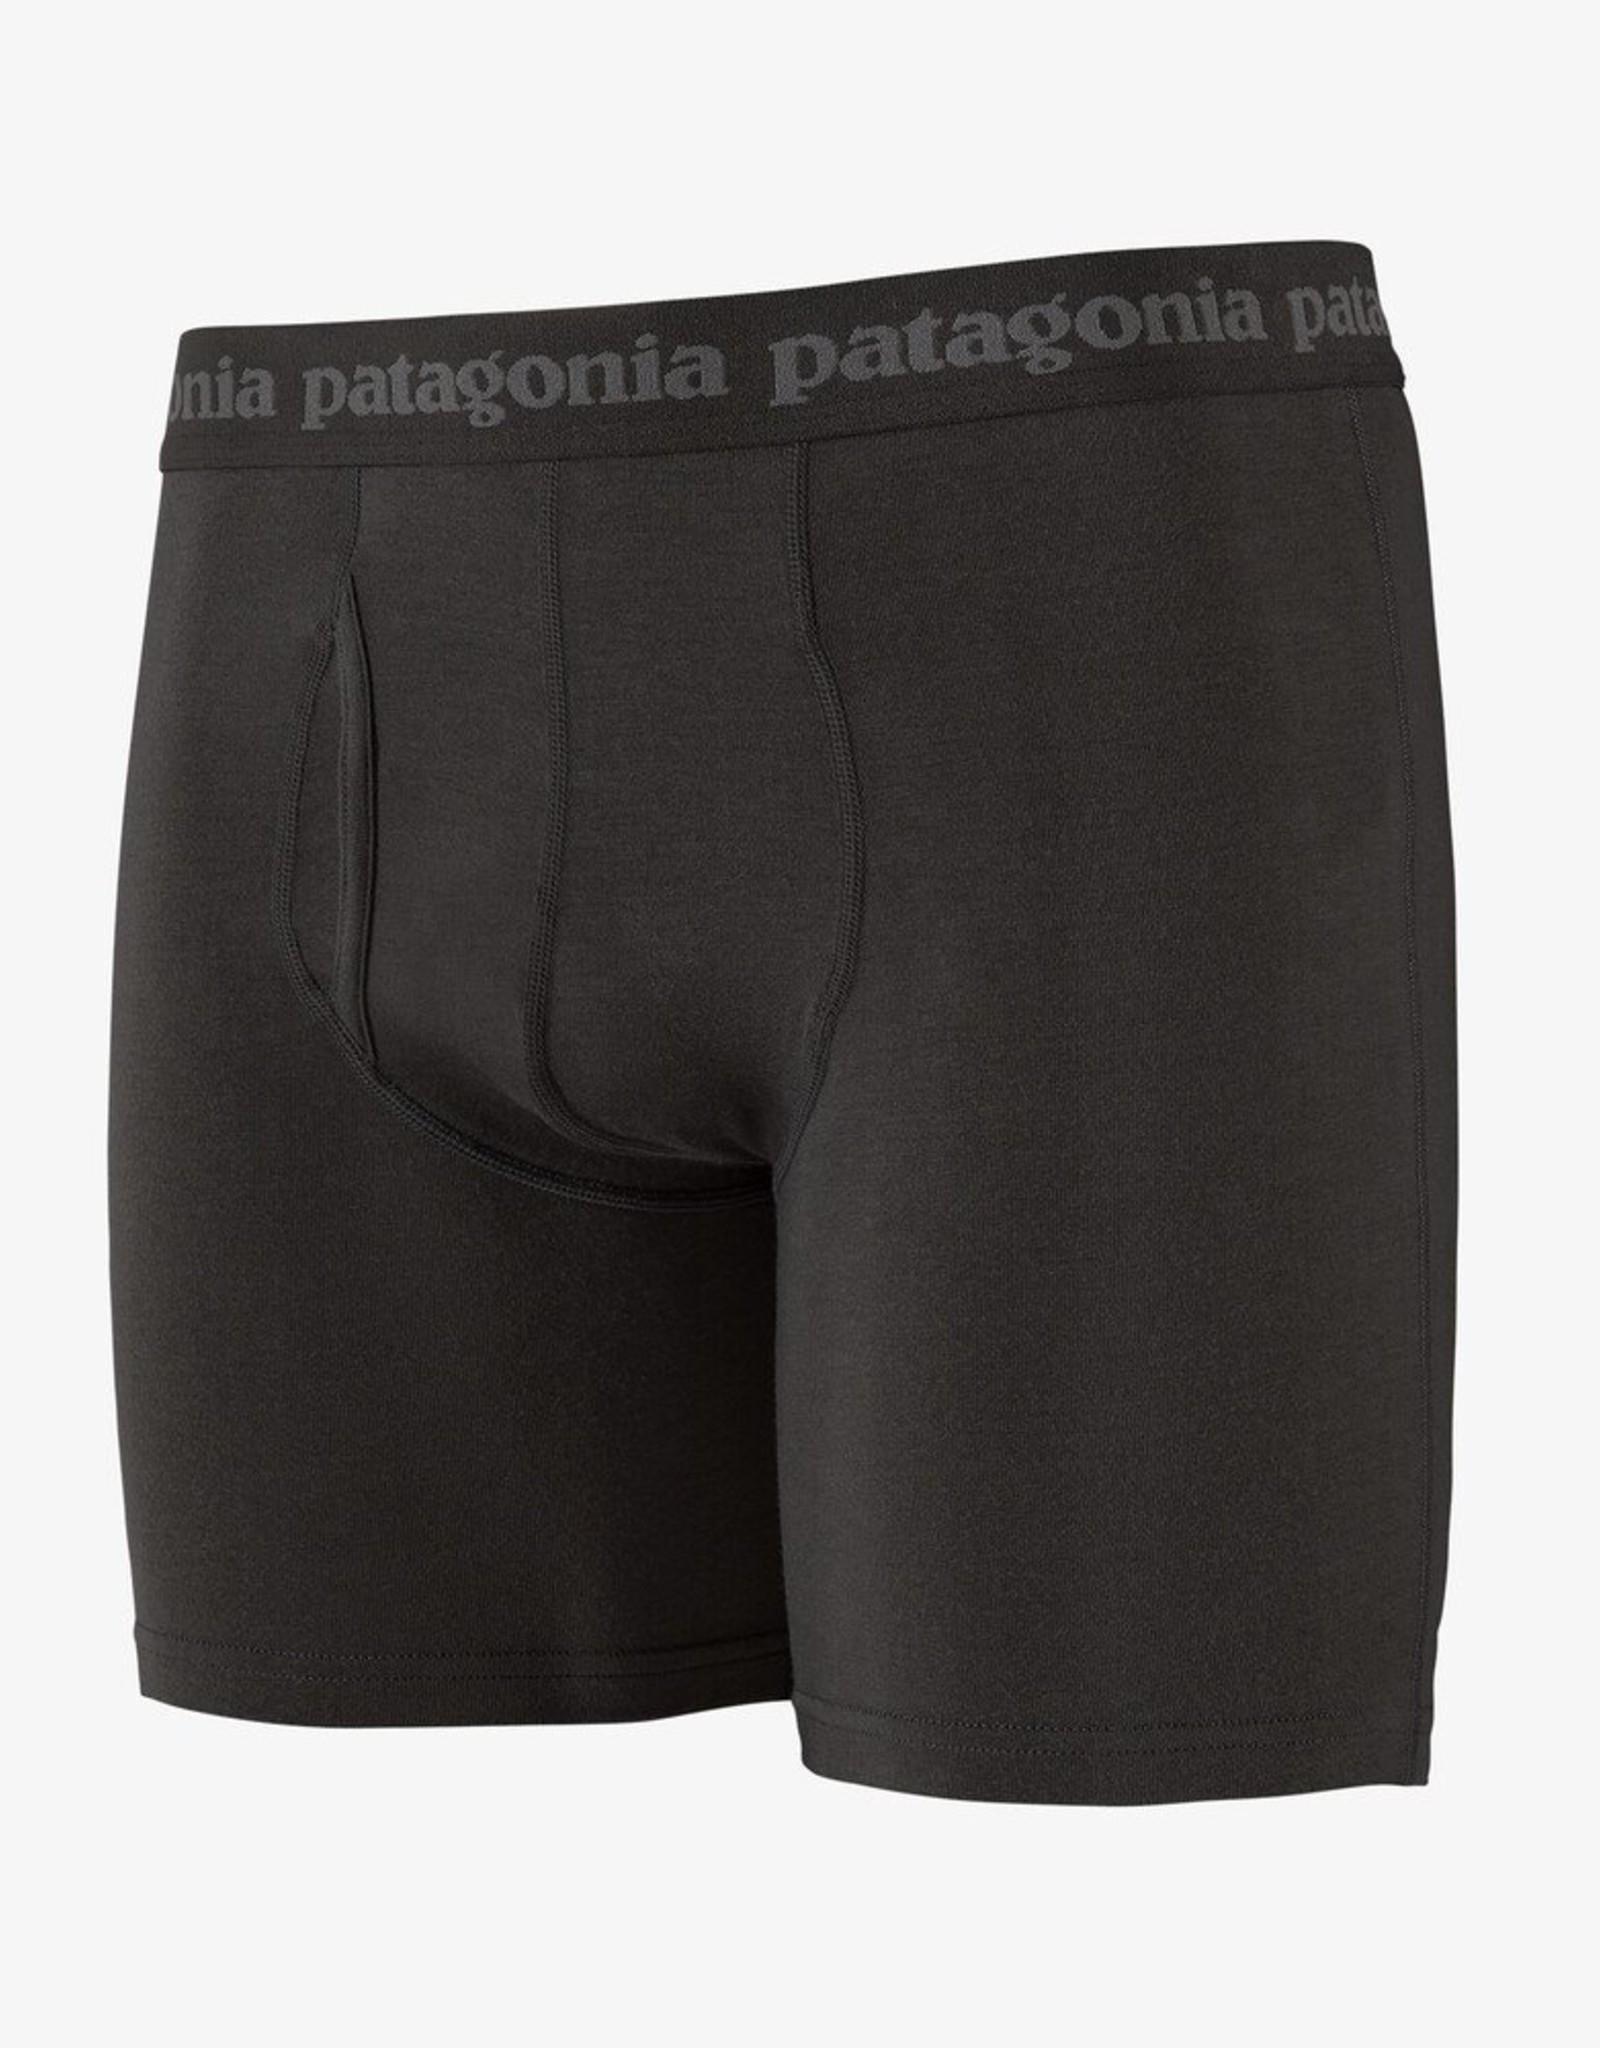 Patagonia Patagonia M's Essential Boxer 6in